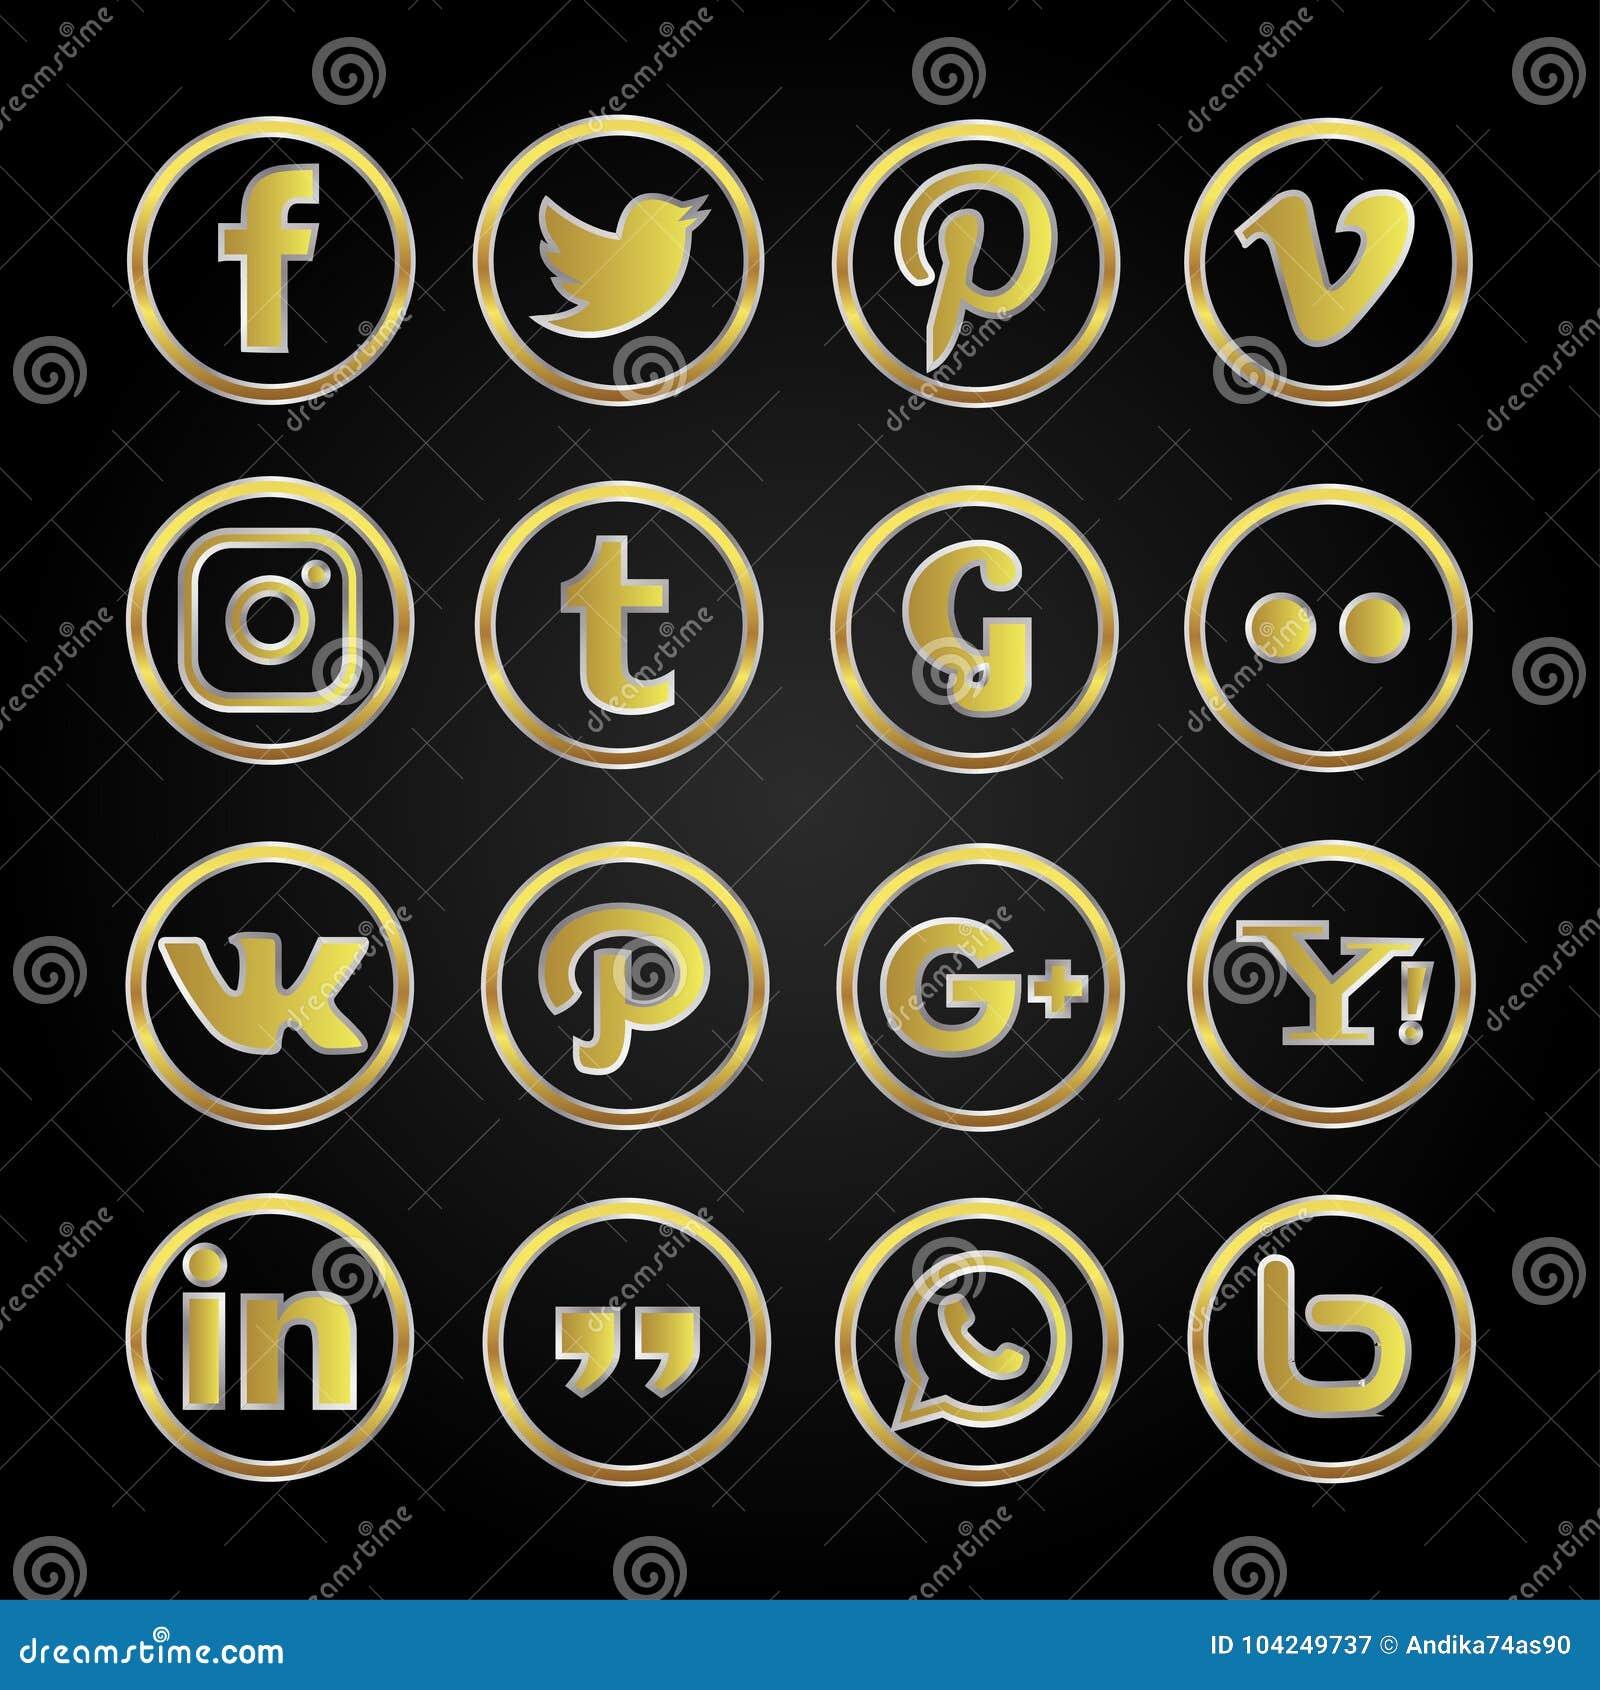 Gold icon social media set